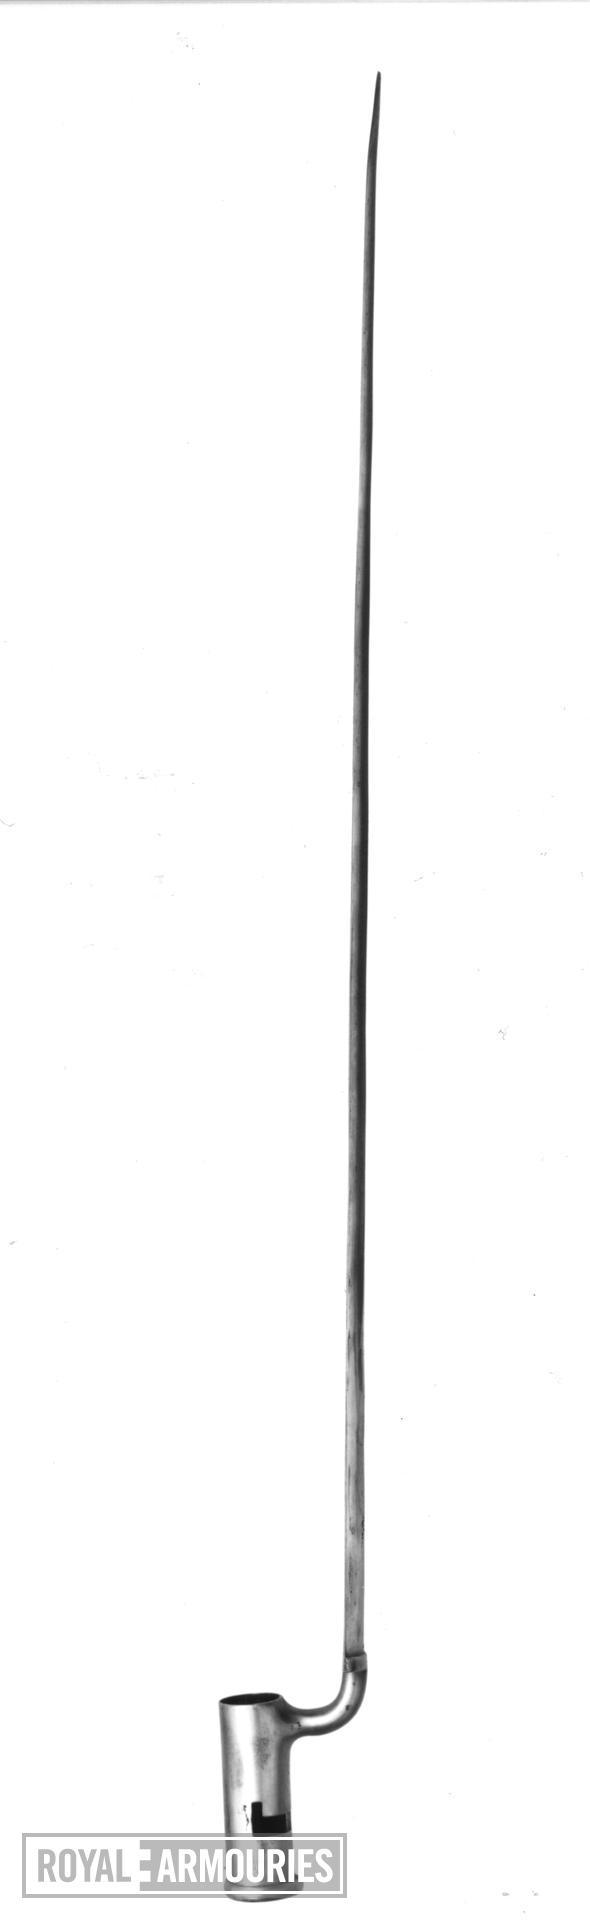 Bayonet Carbine bayonet